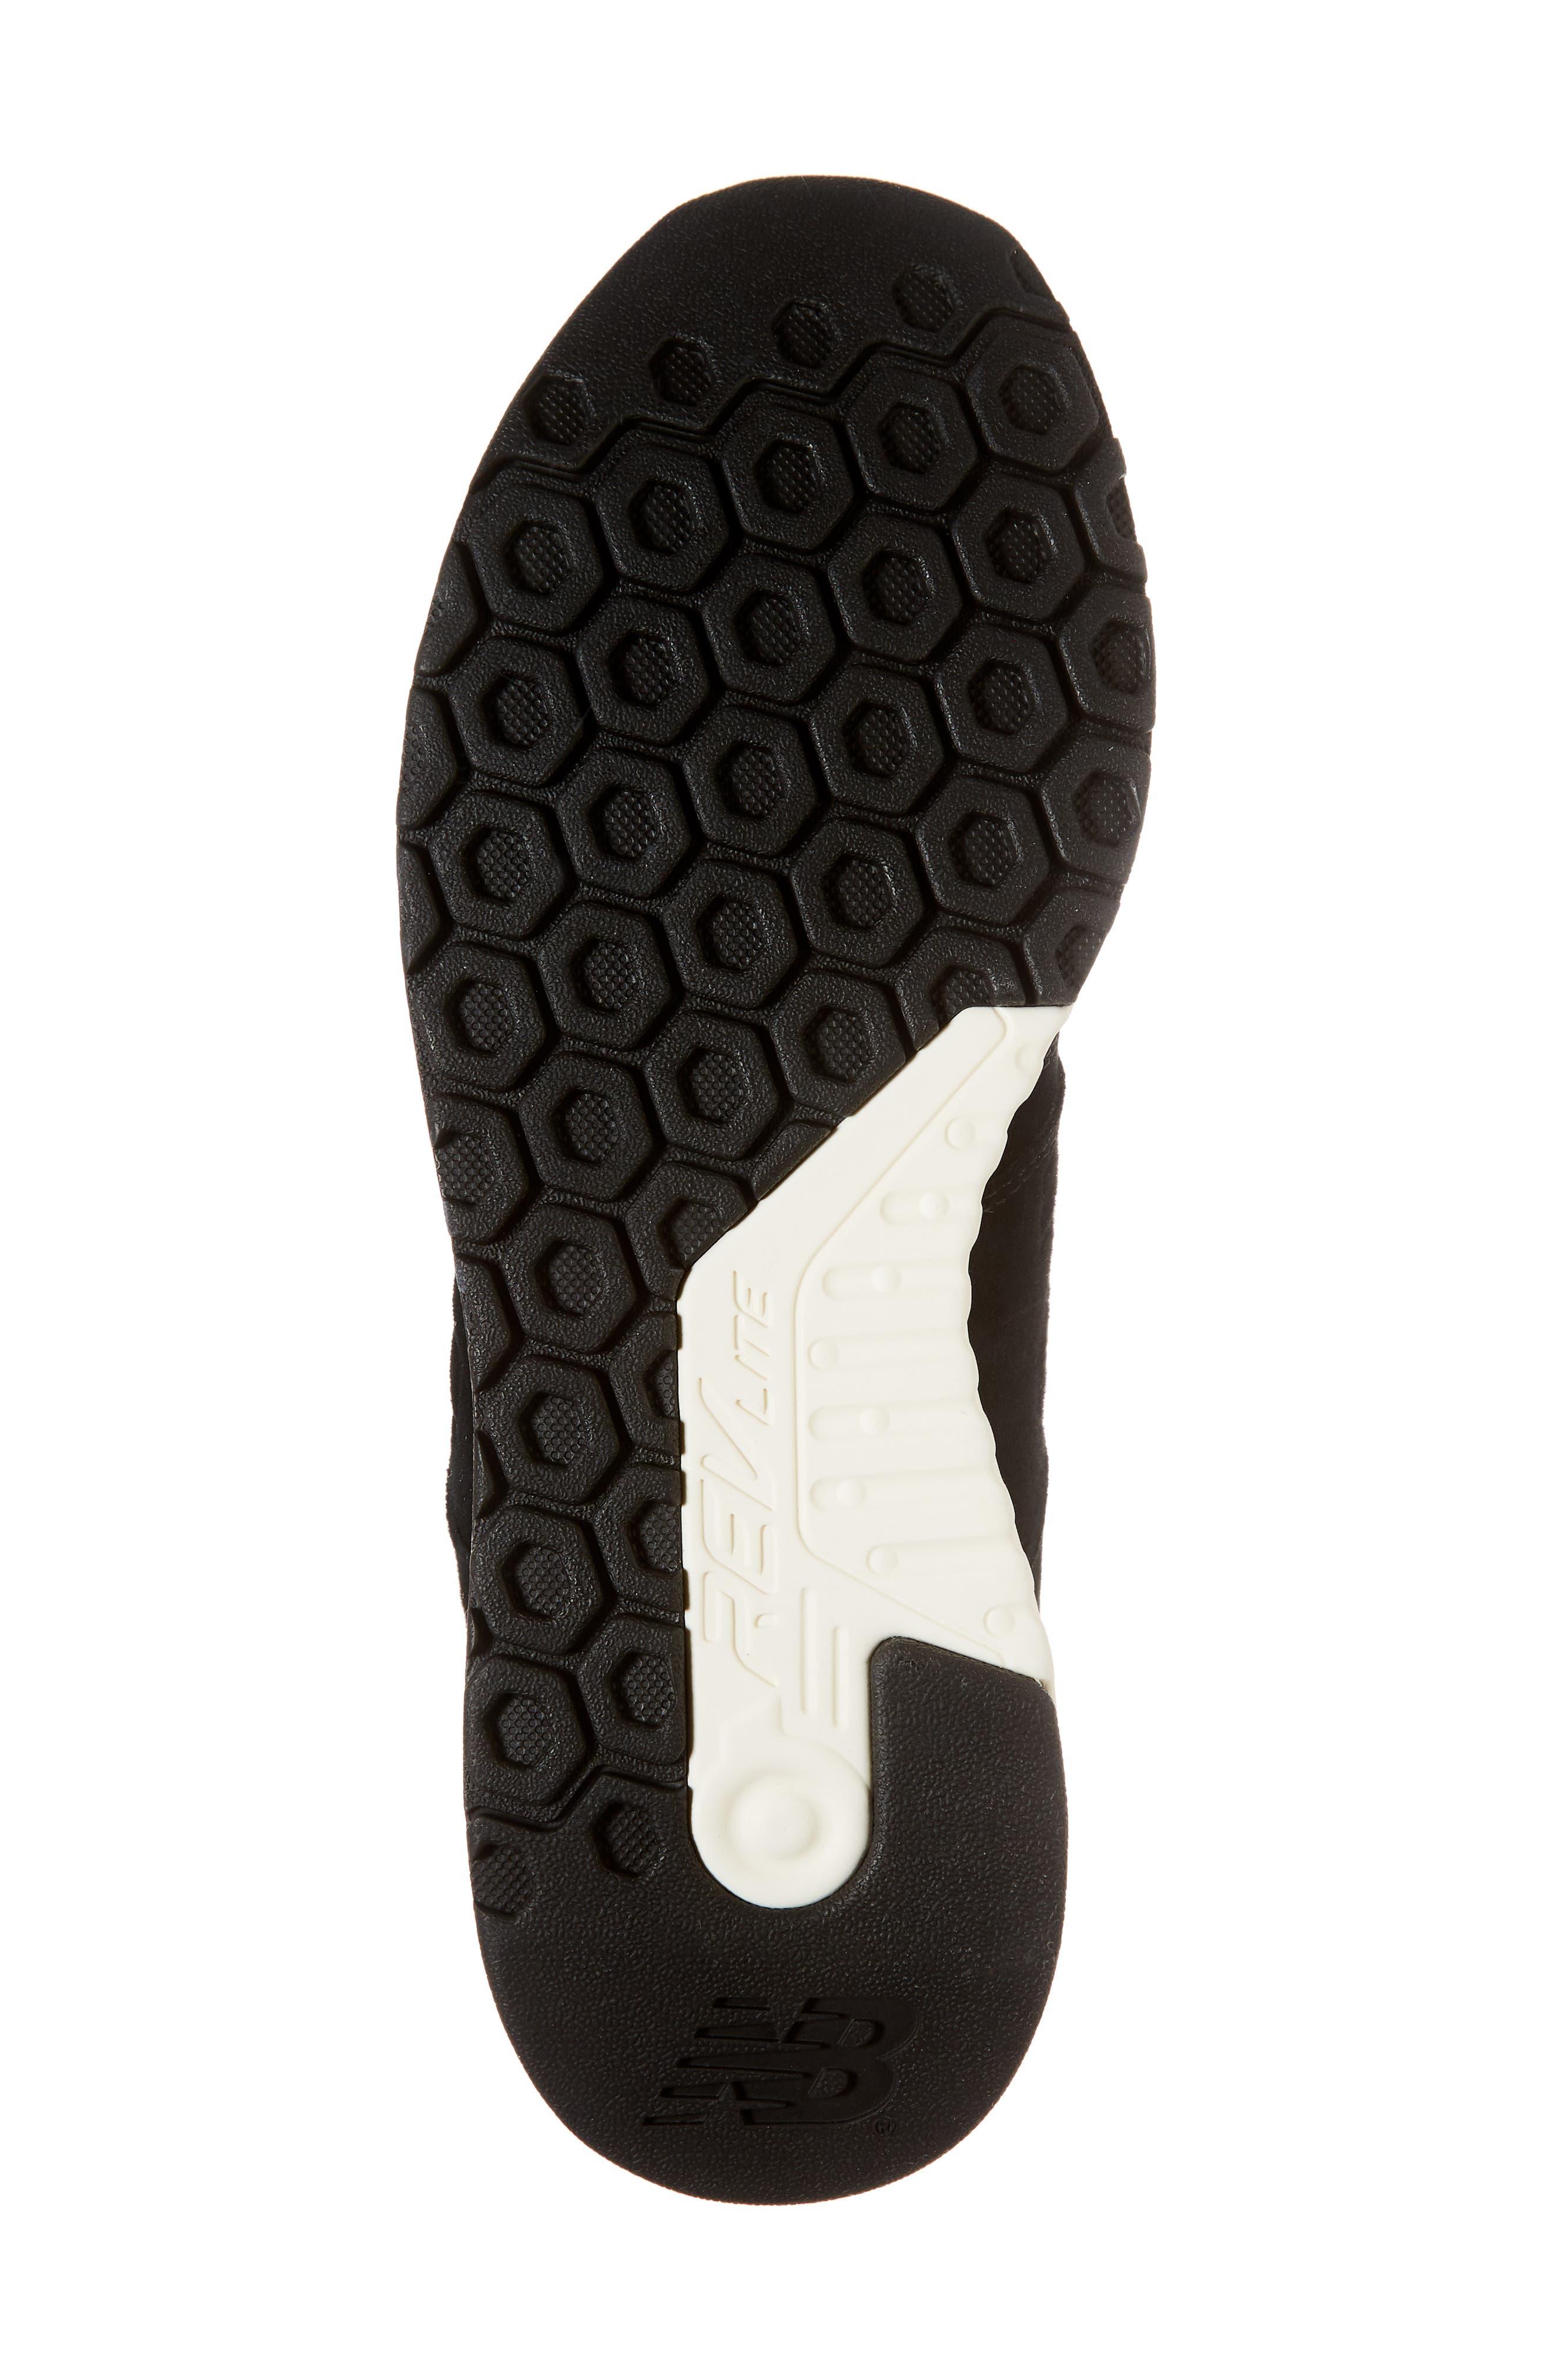 247 Luxe Sneaker,                             Alternate thumbnail 6, color,                             BLACK